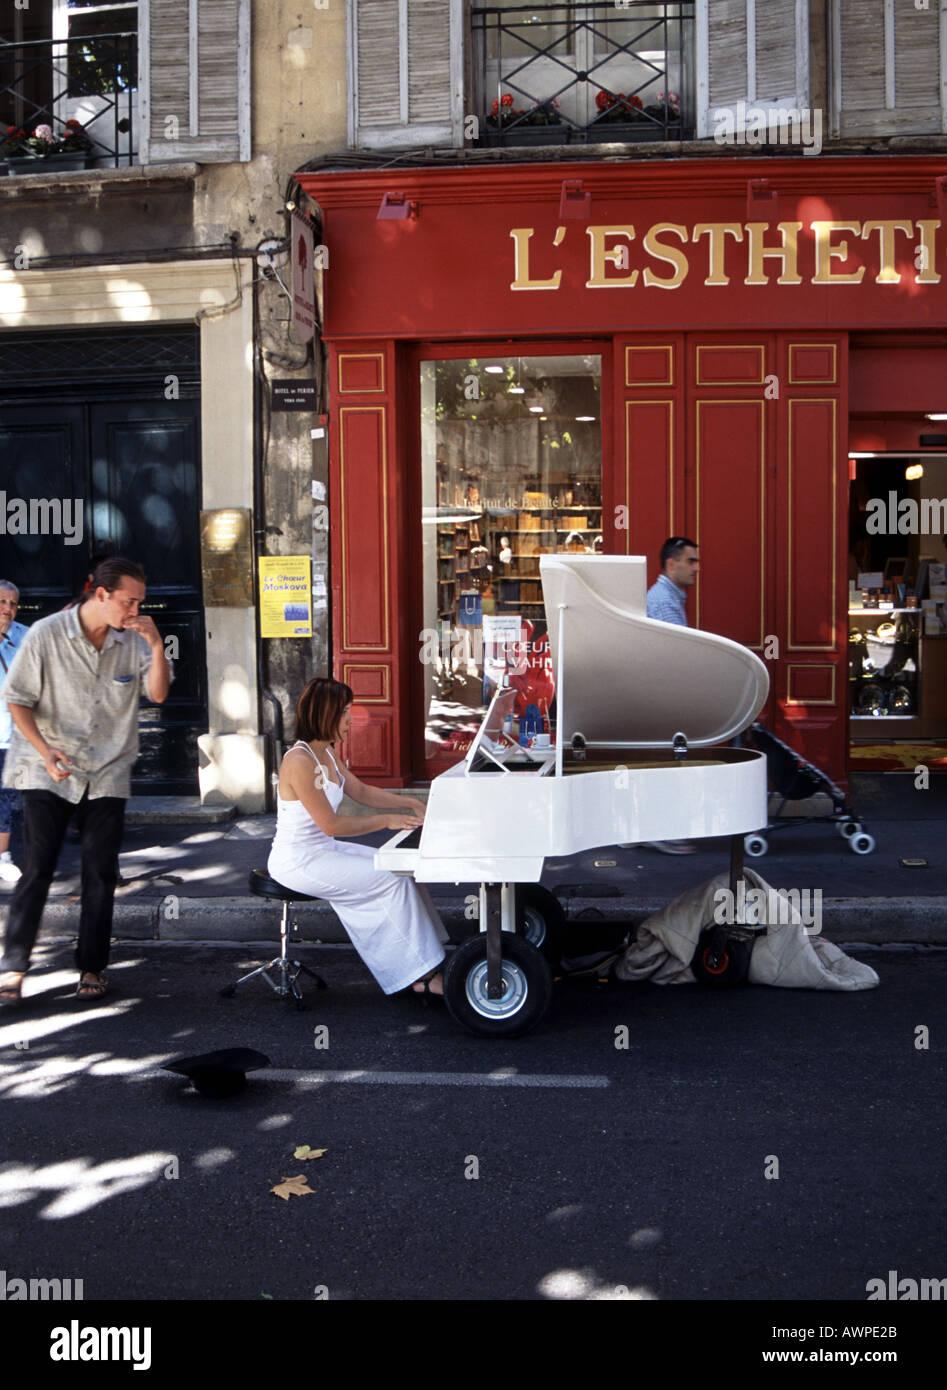 Piano recital in the market Aix en Provence - Stock Image